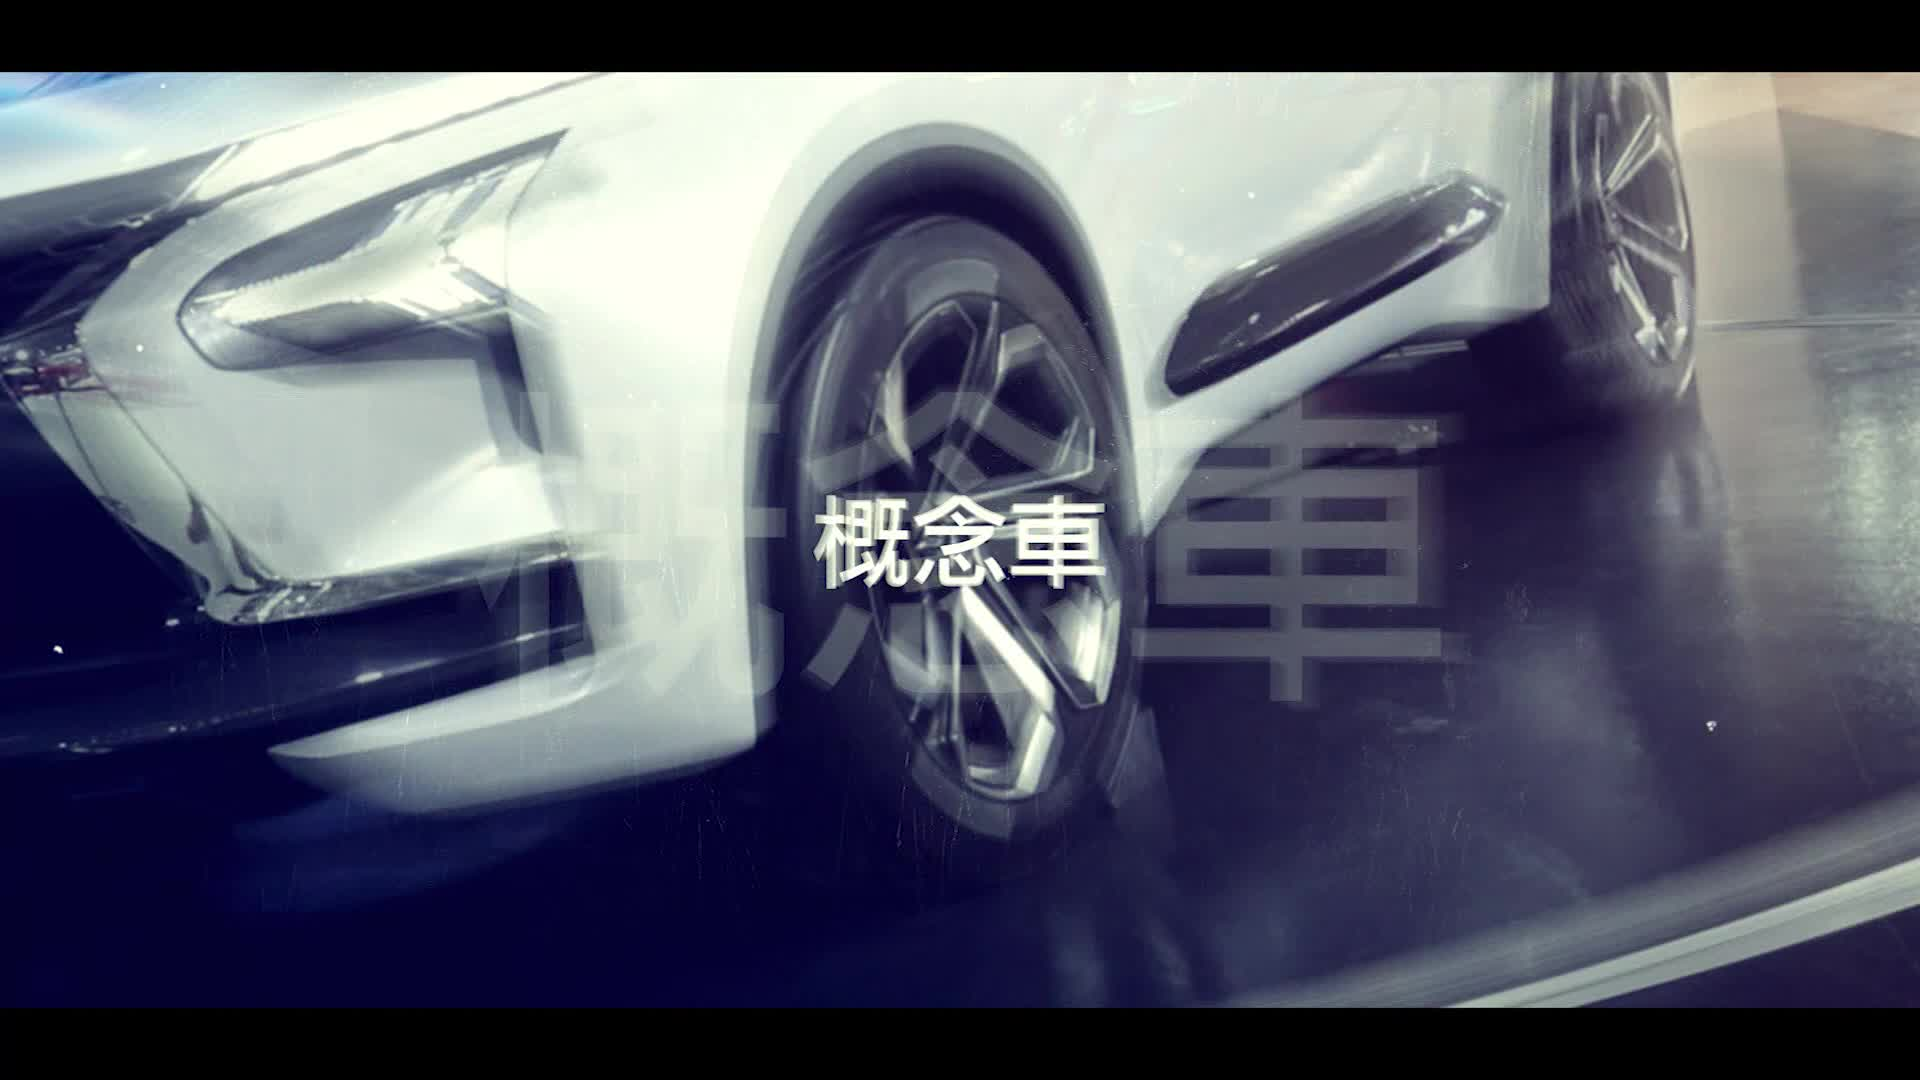 【Go車誌 2020車展報導】Honda 四輪尬二輪!Moto GP 冠軍車同場亮相